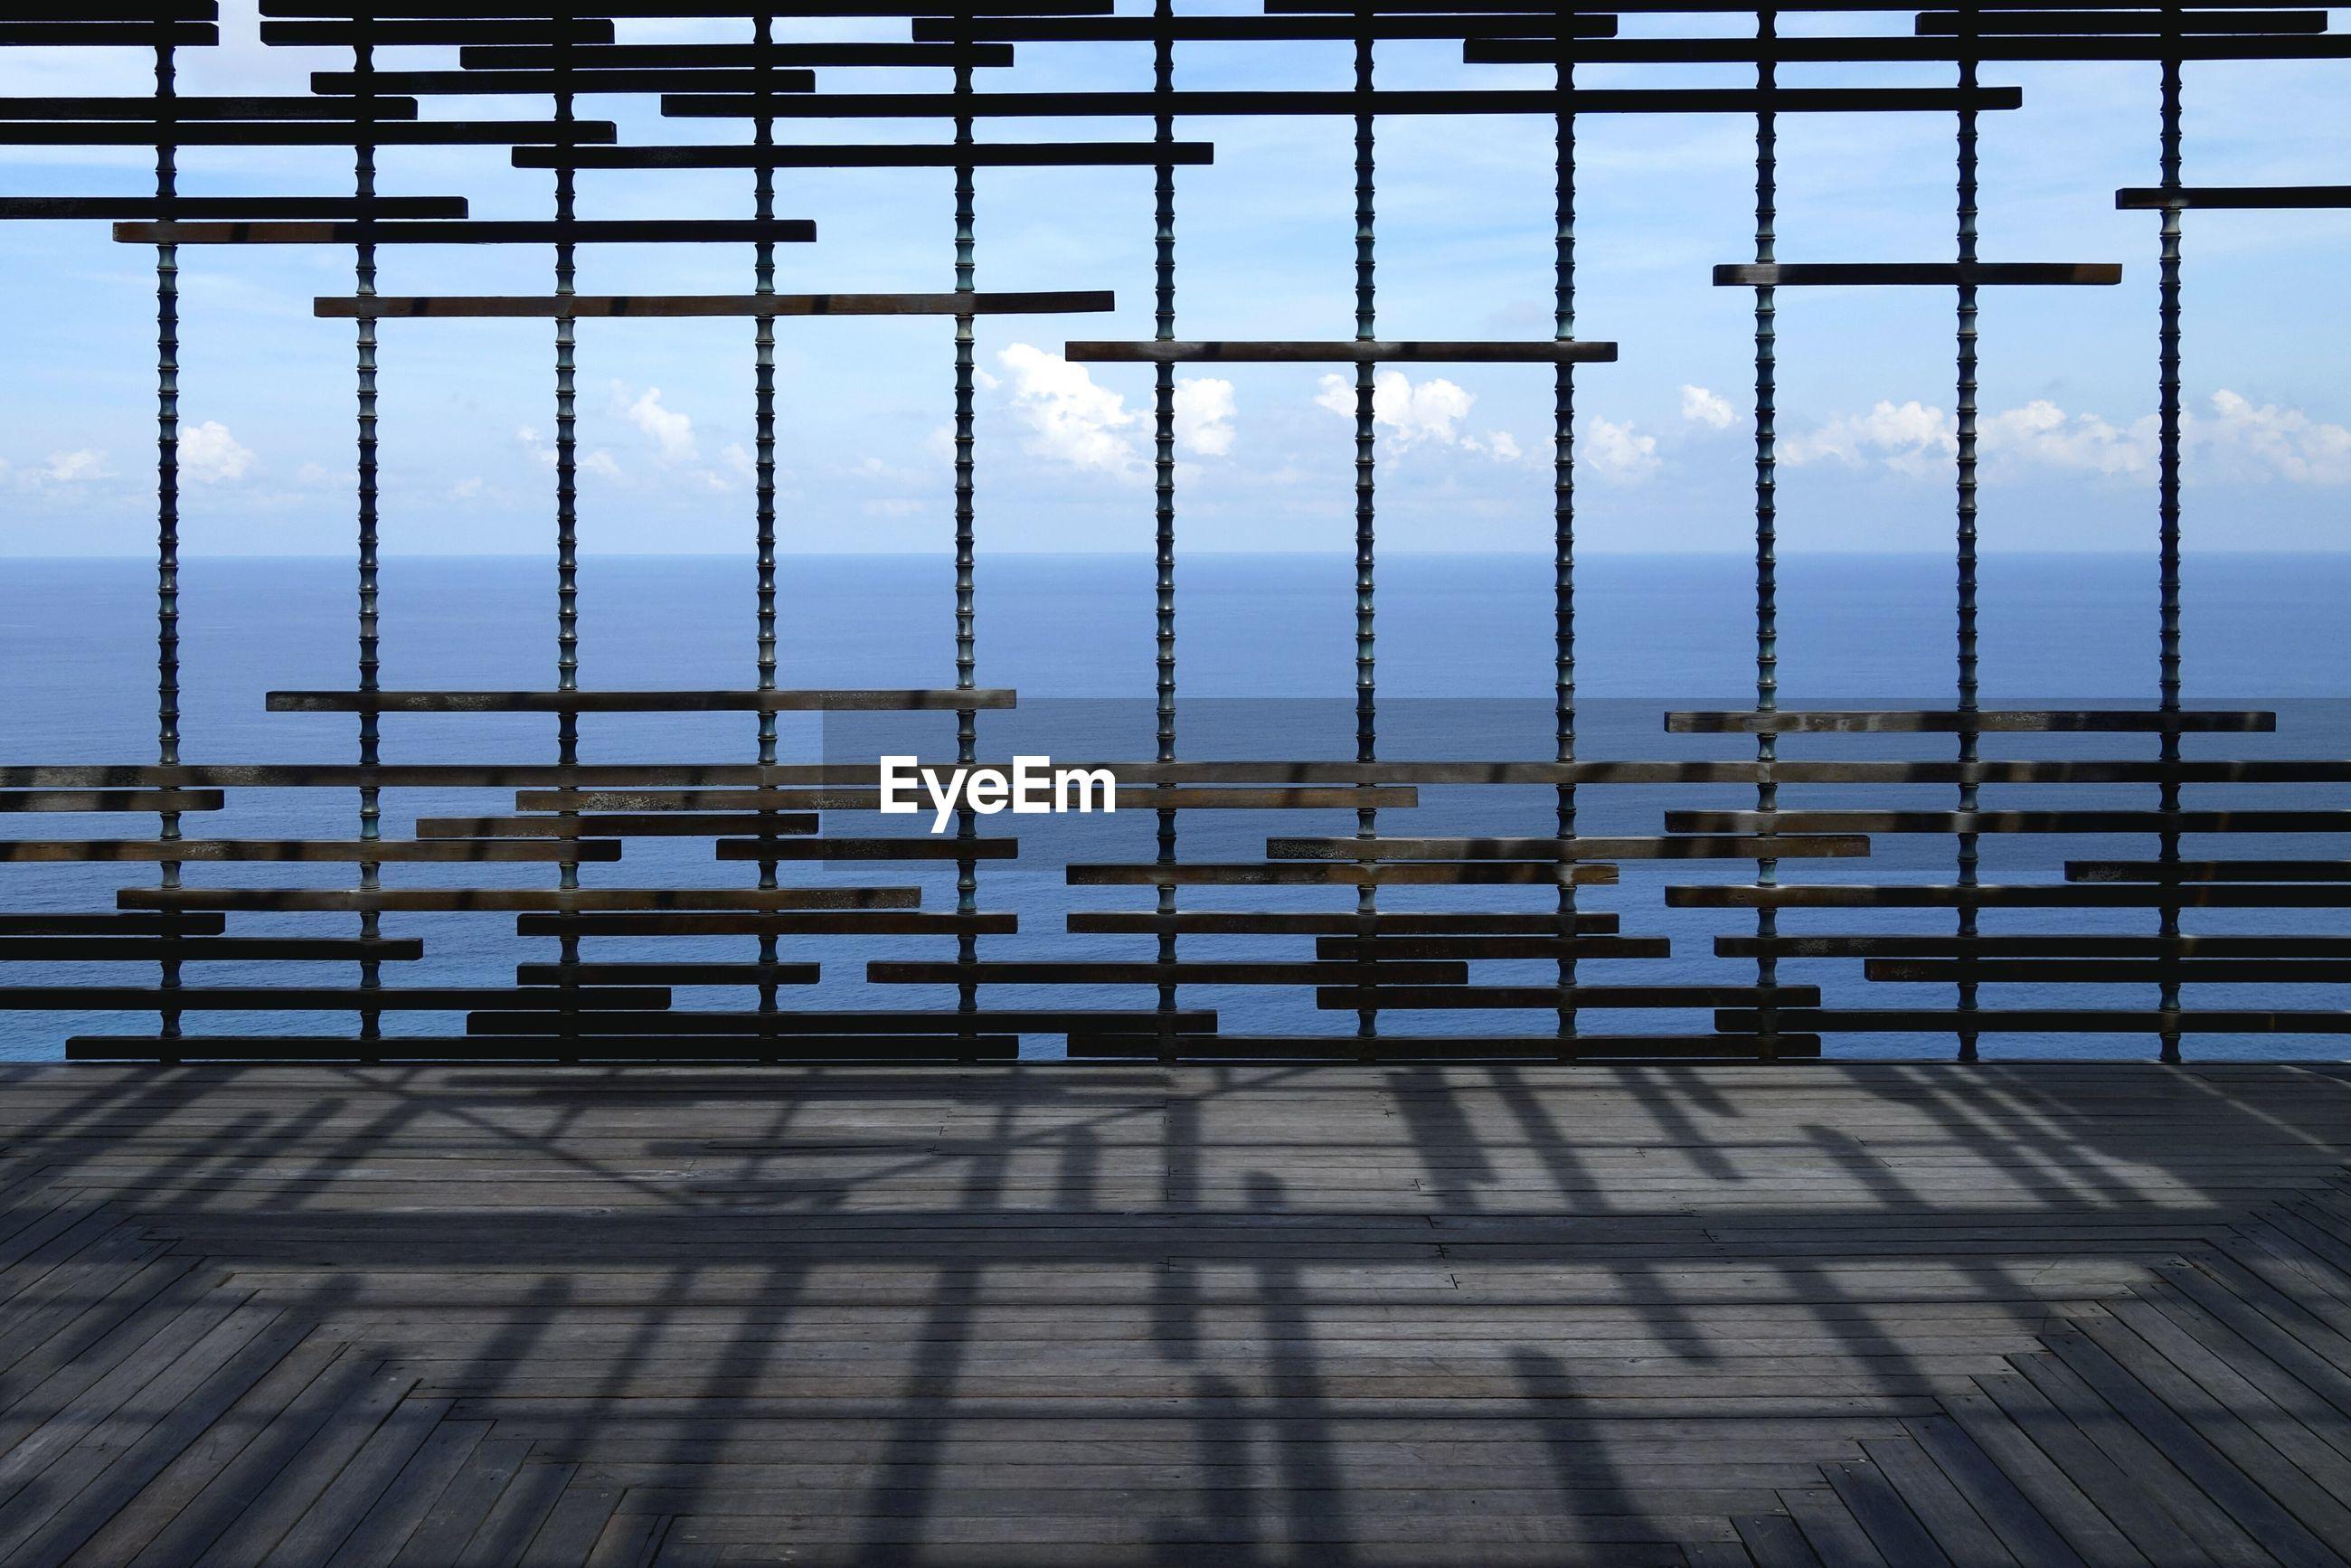 Sea seen through metal grate on pier